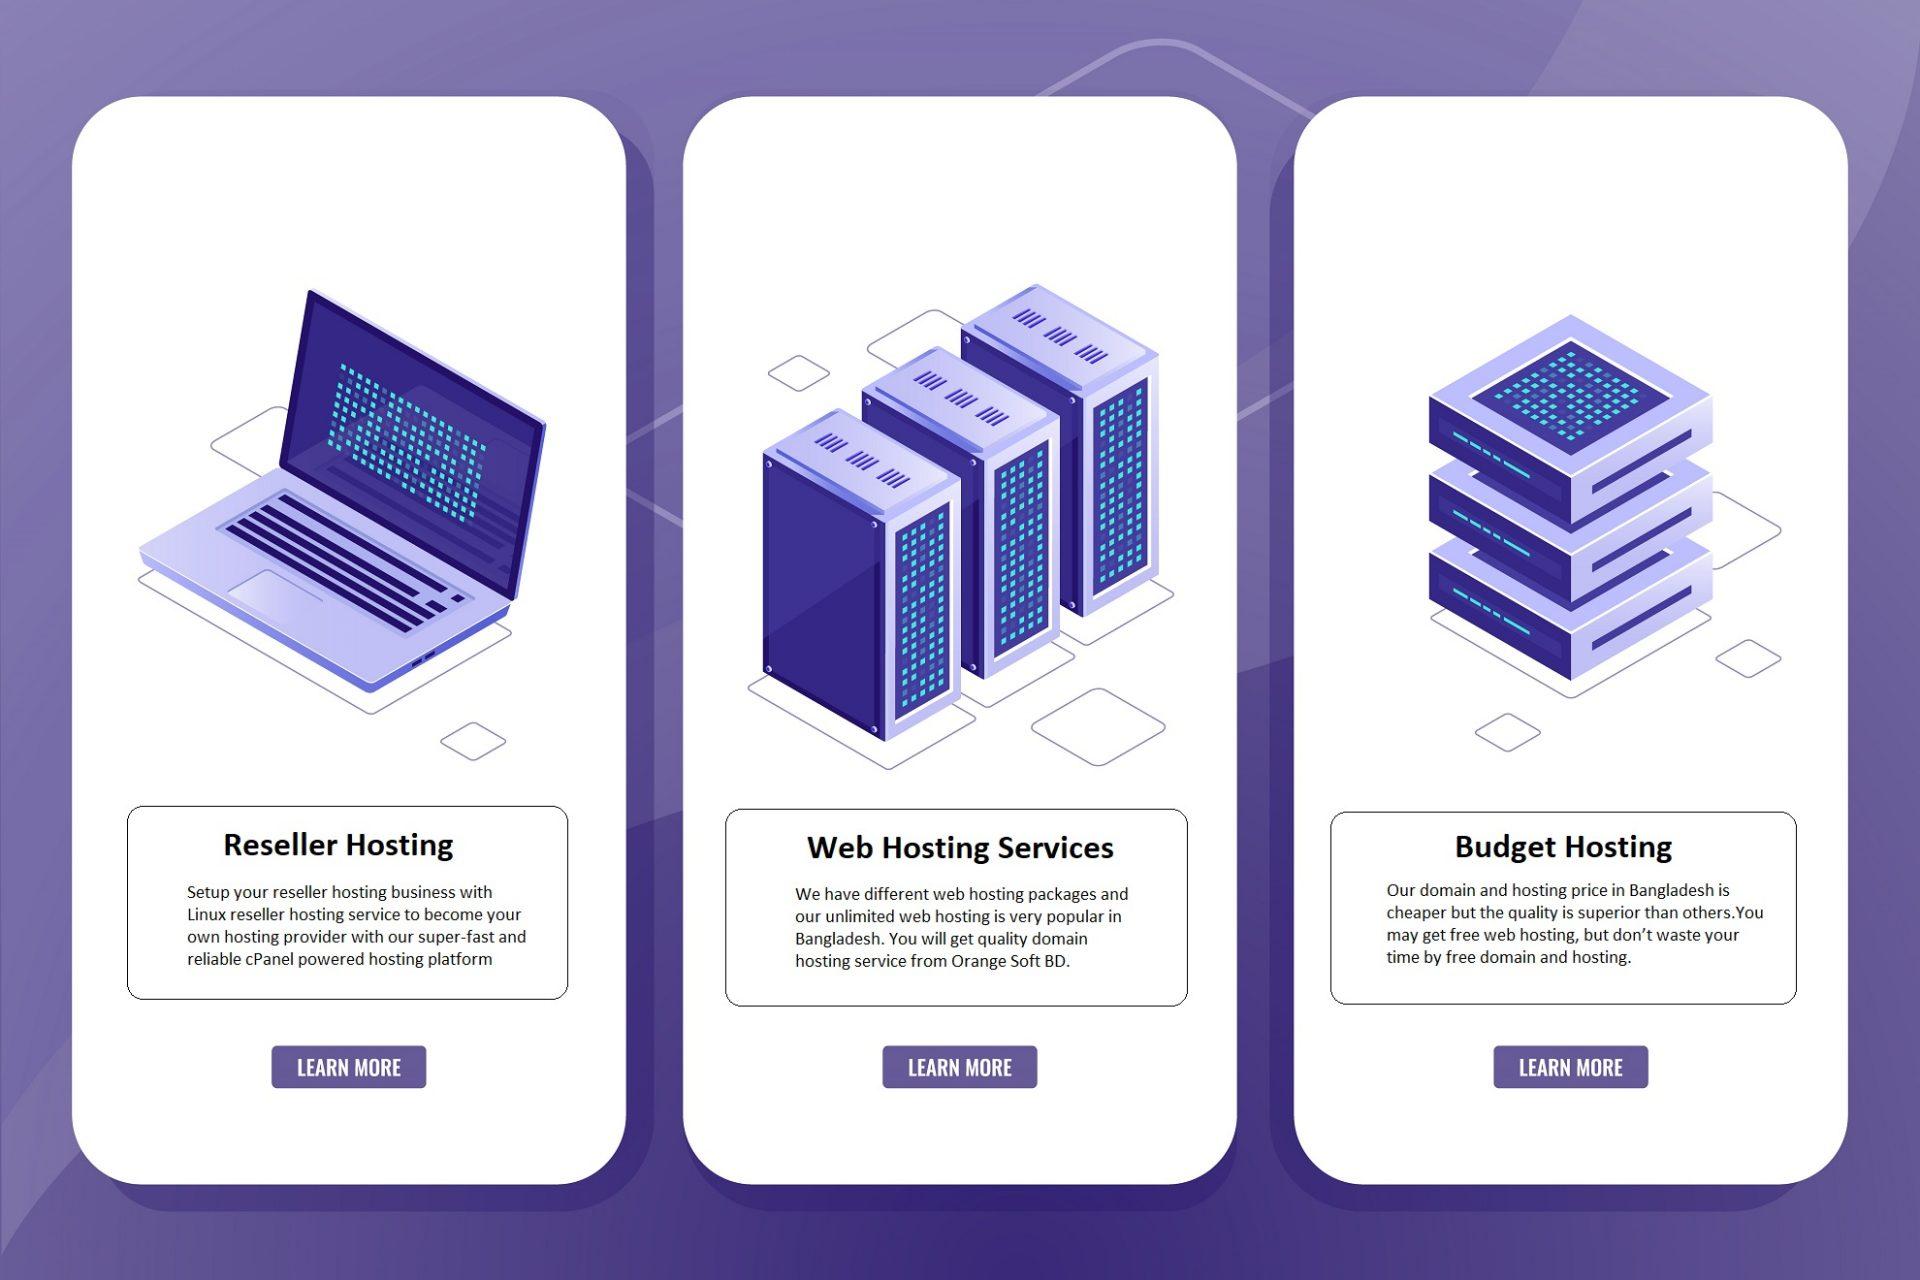 Budget Hosting for web hosting